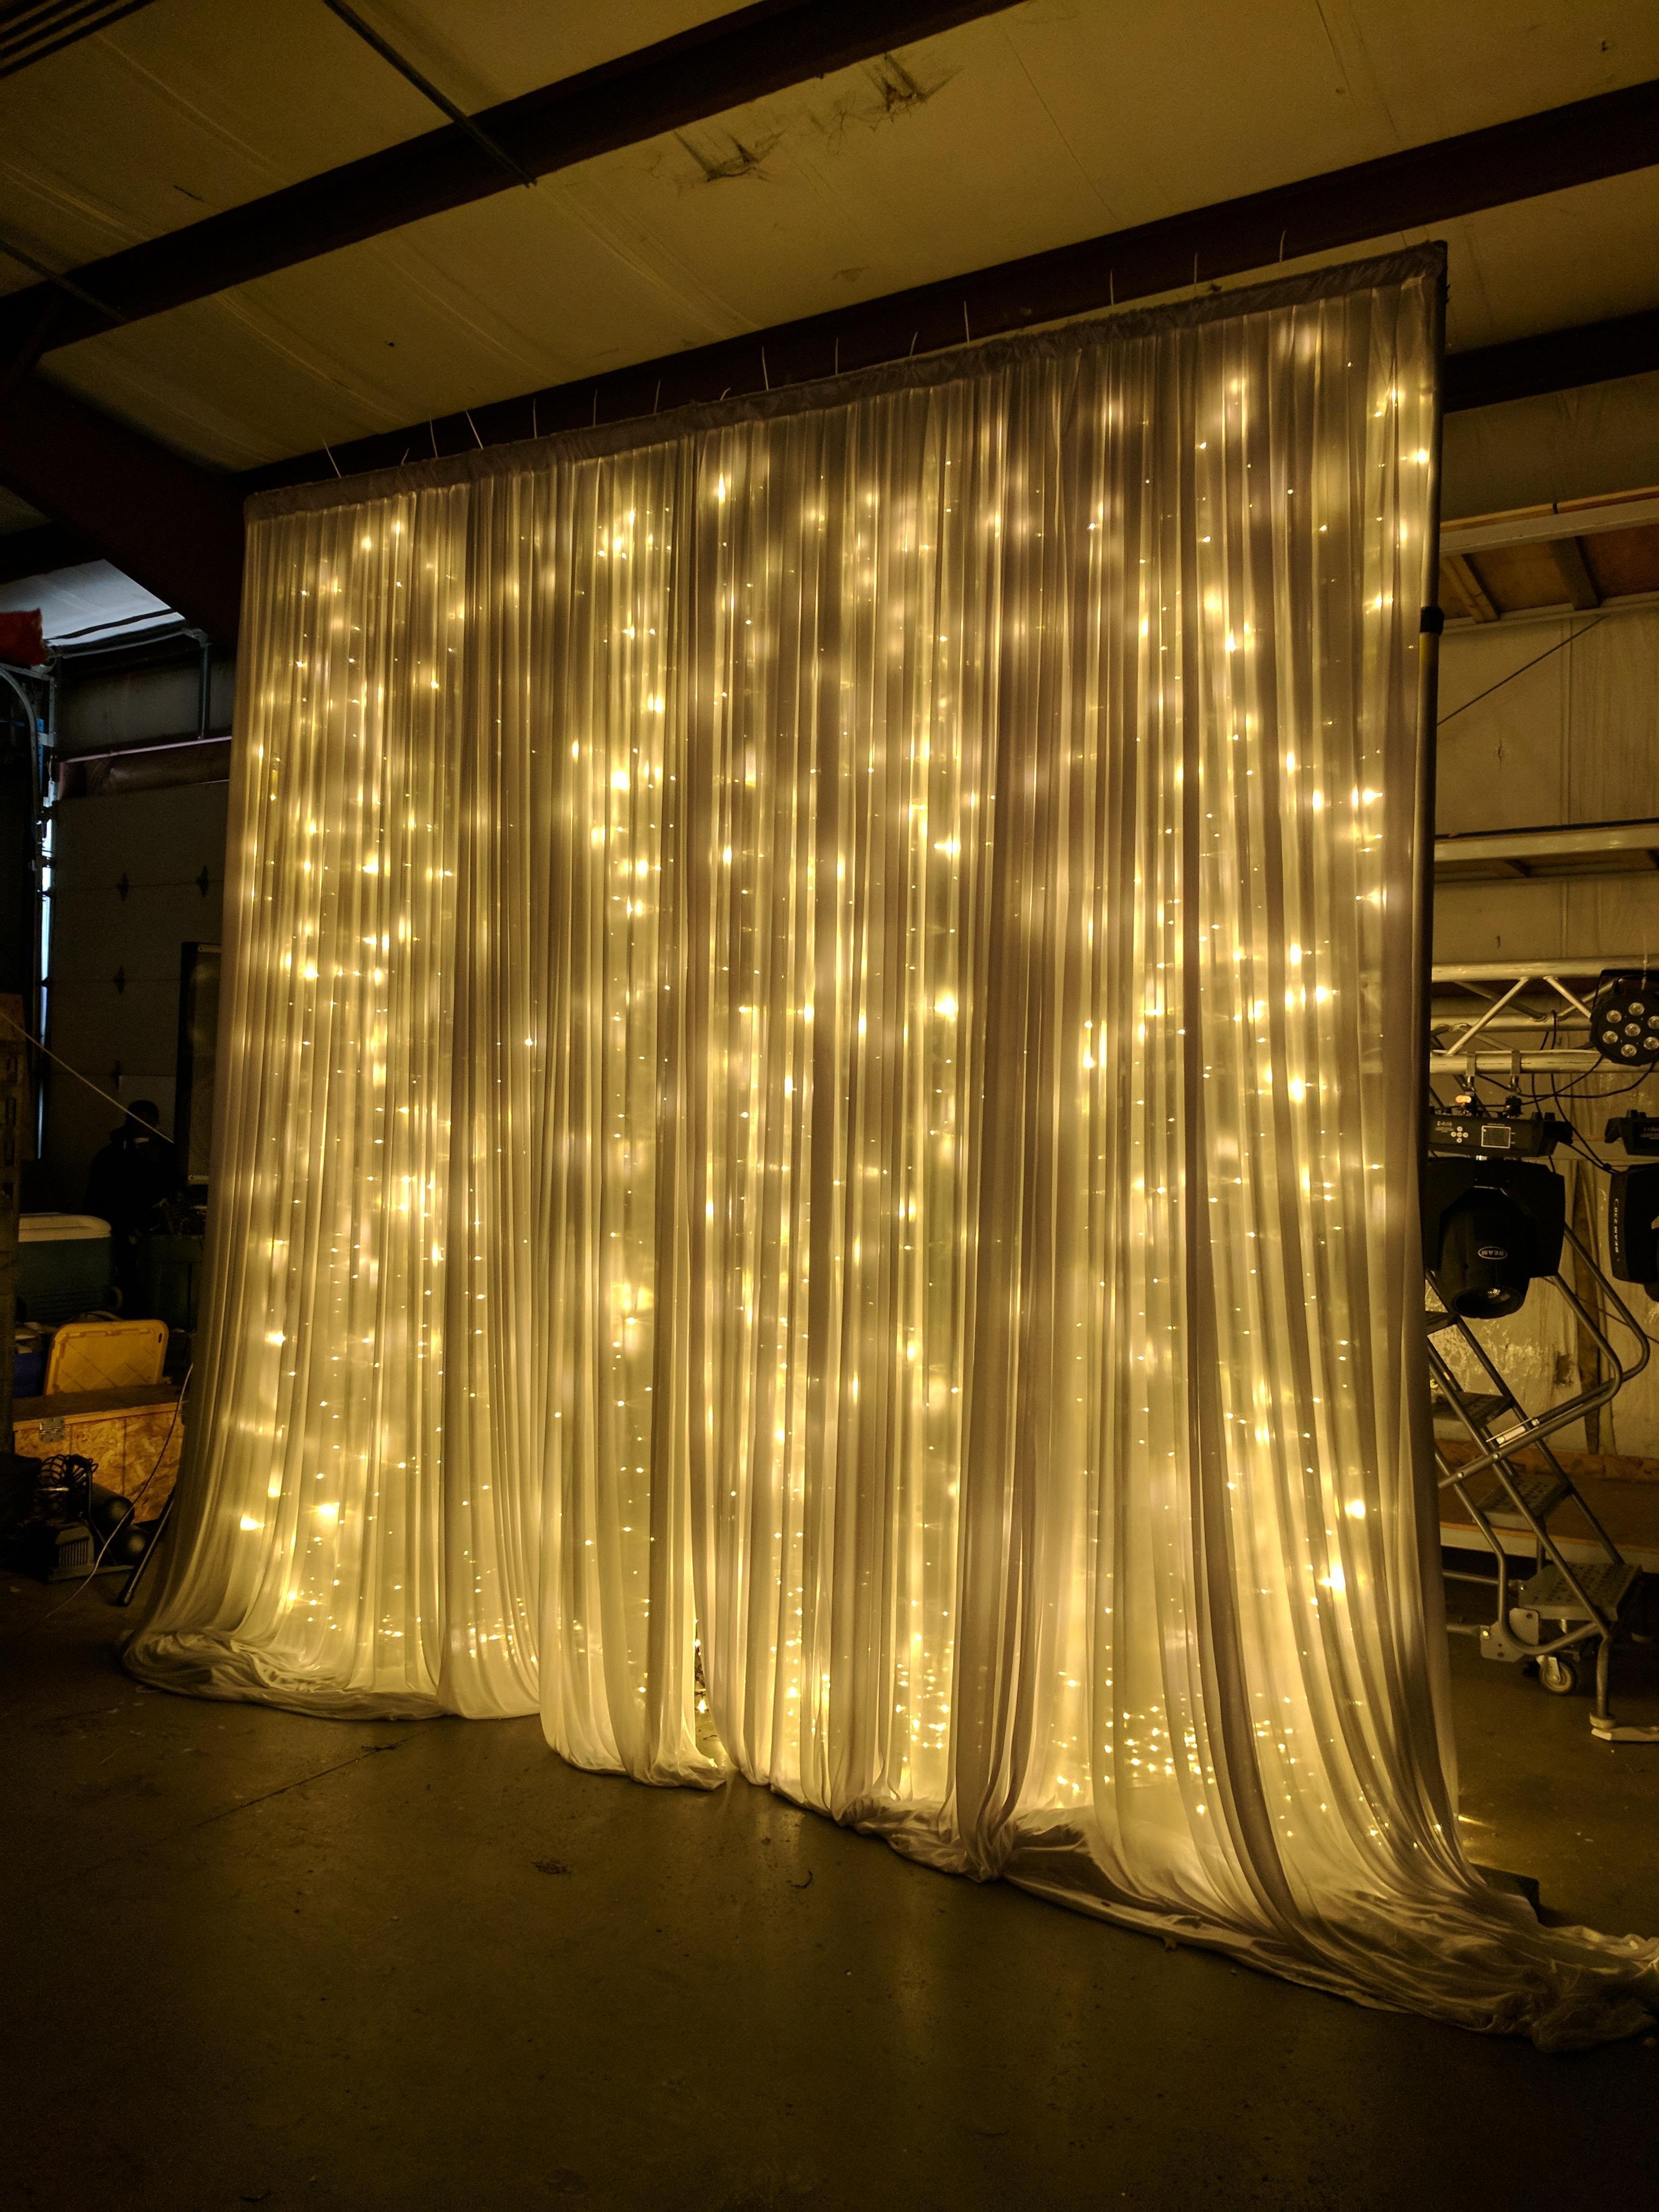 Lit Curtain Lighting